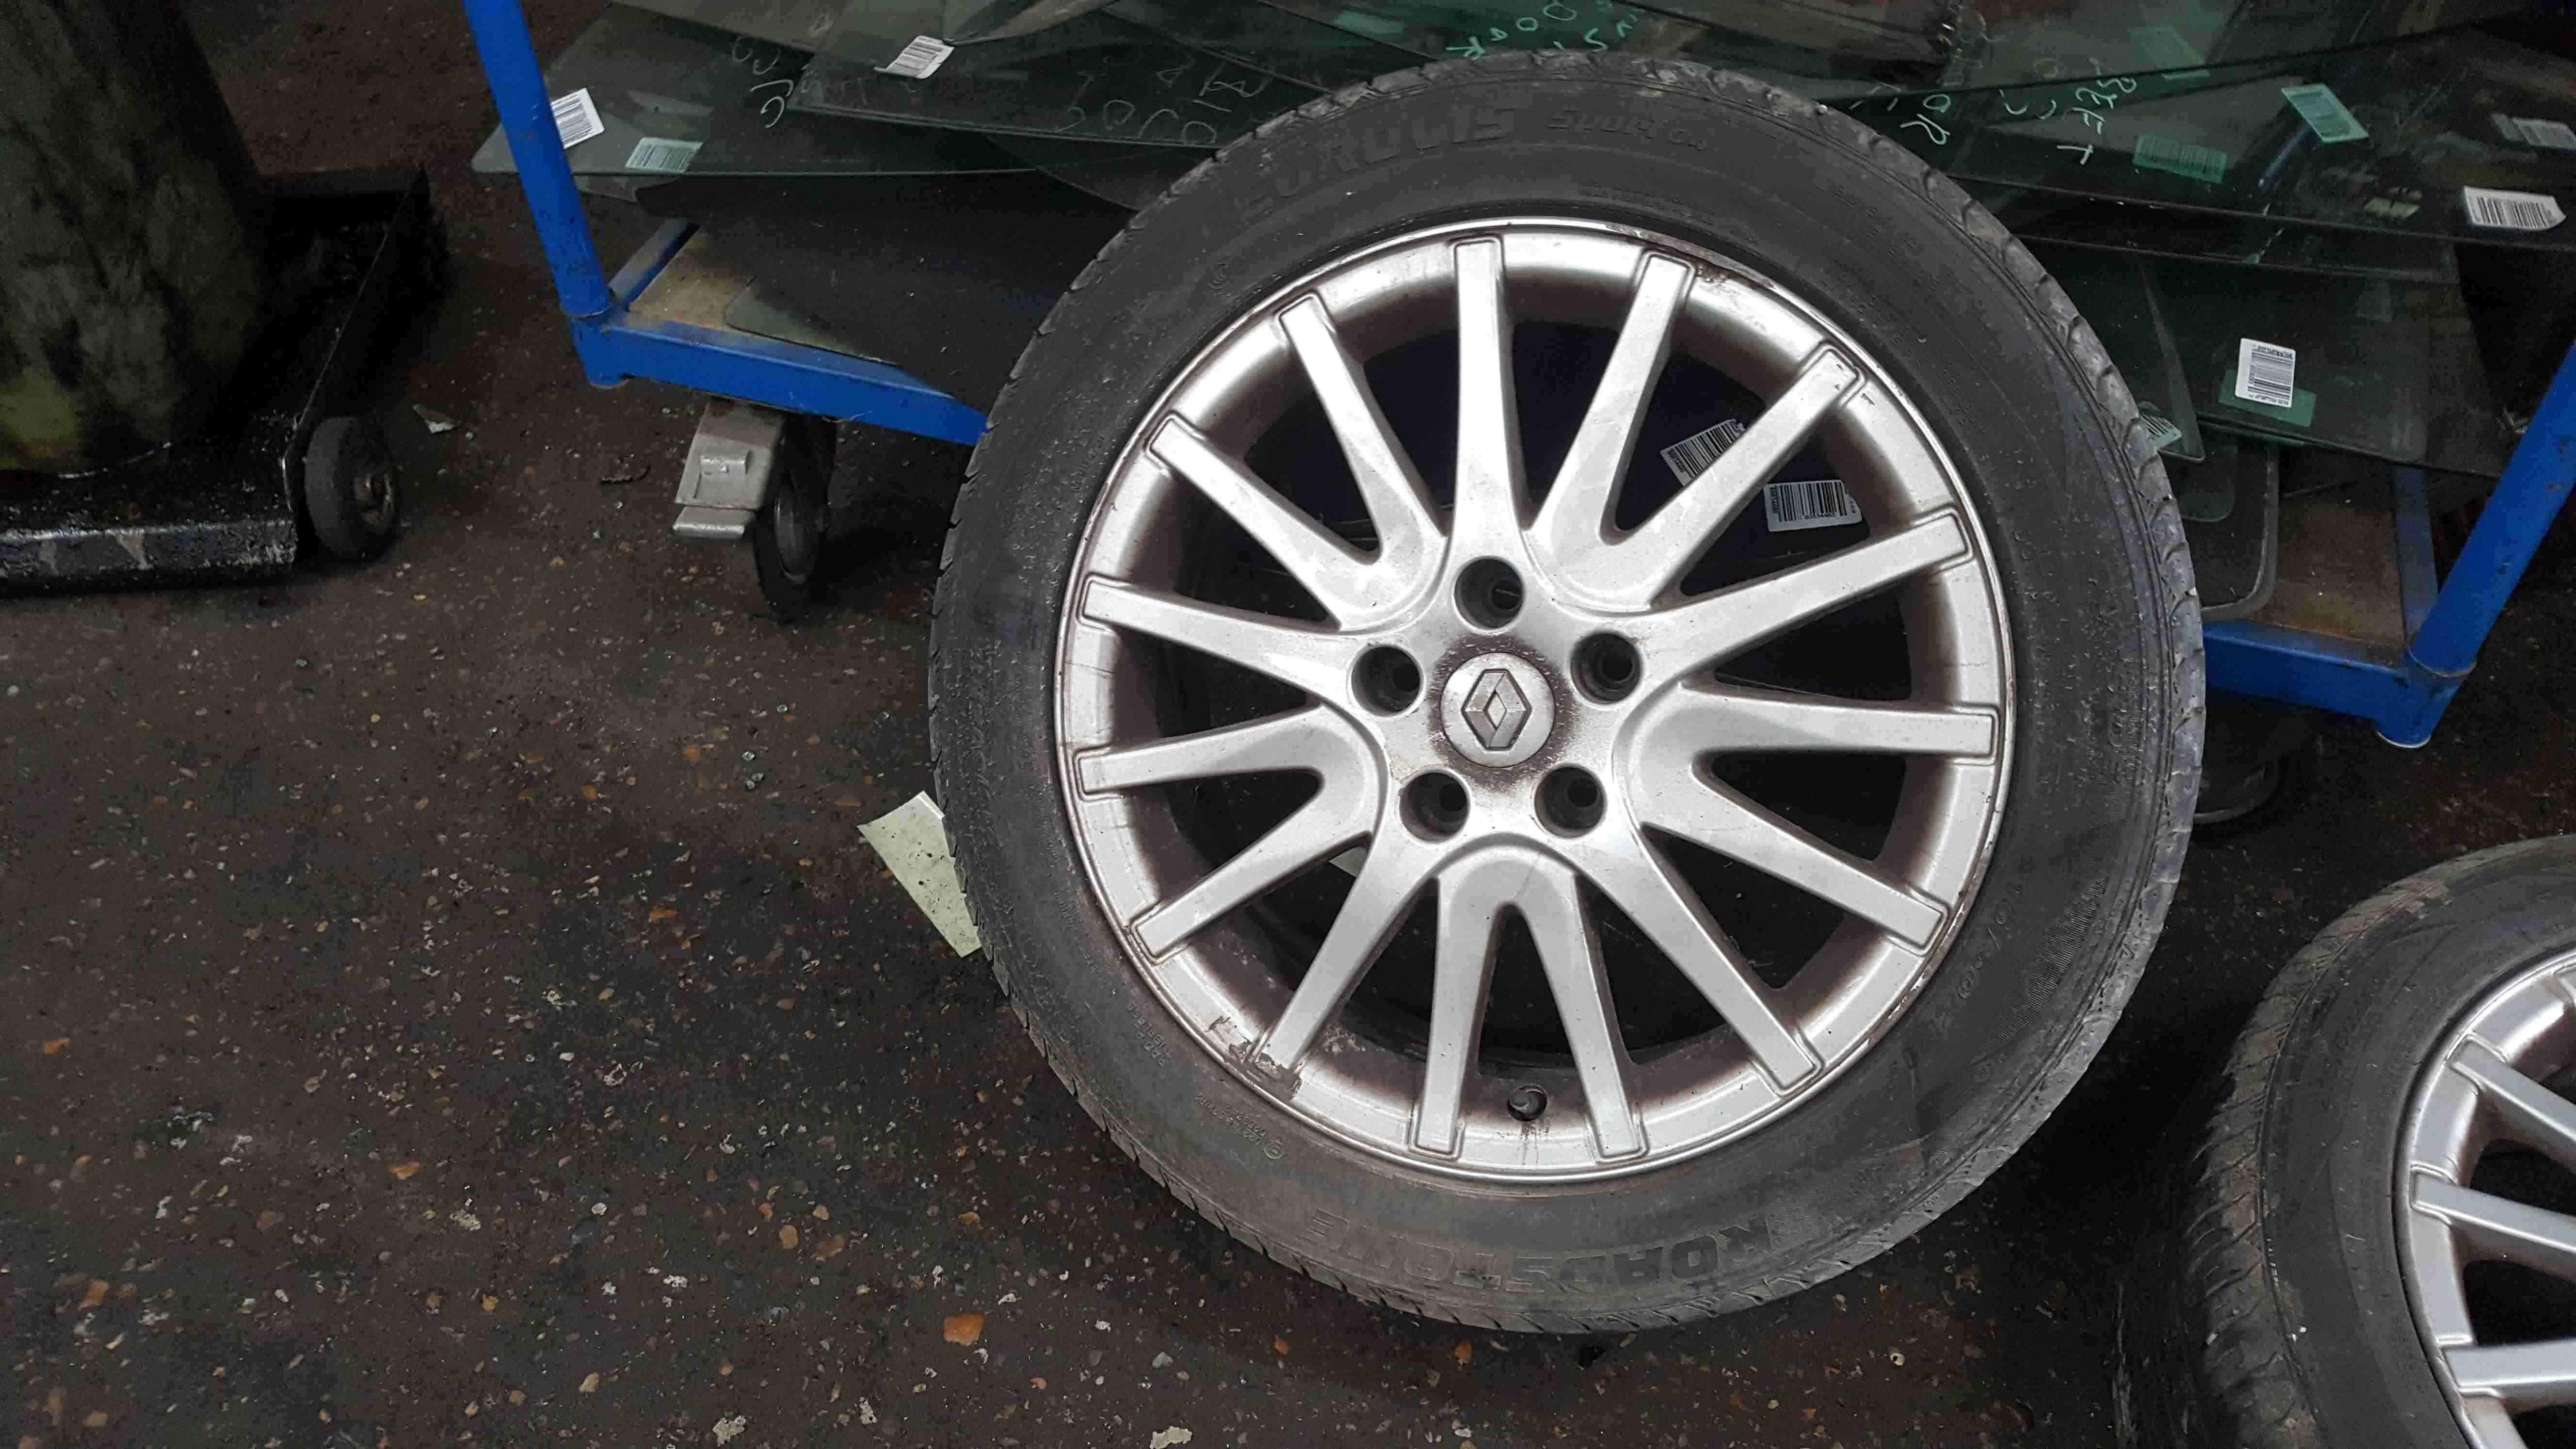 Renault Laguna MK3 2007-2012 Alloy Wheel 17inch + Tyre 215 50 17 5mm 403000034R